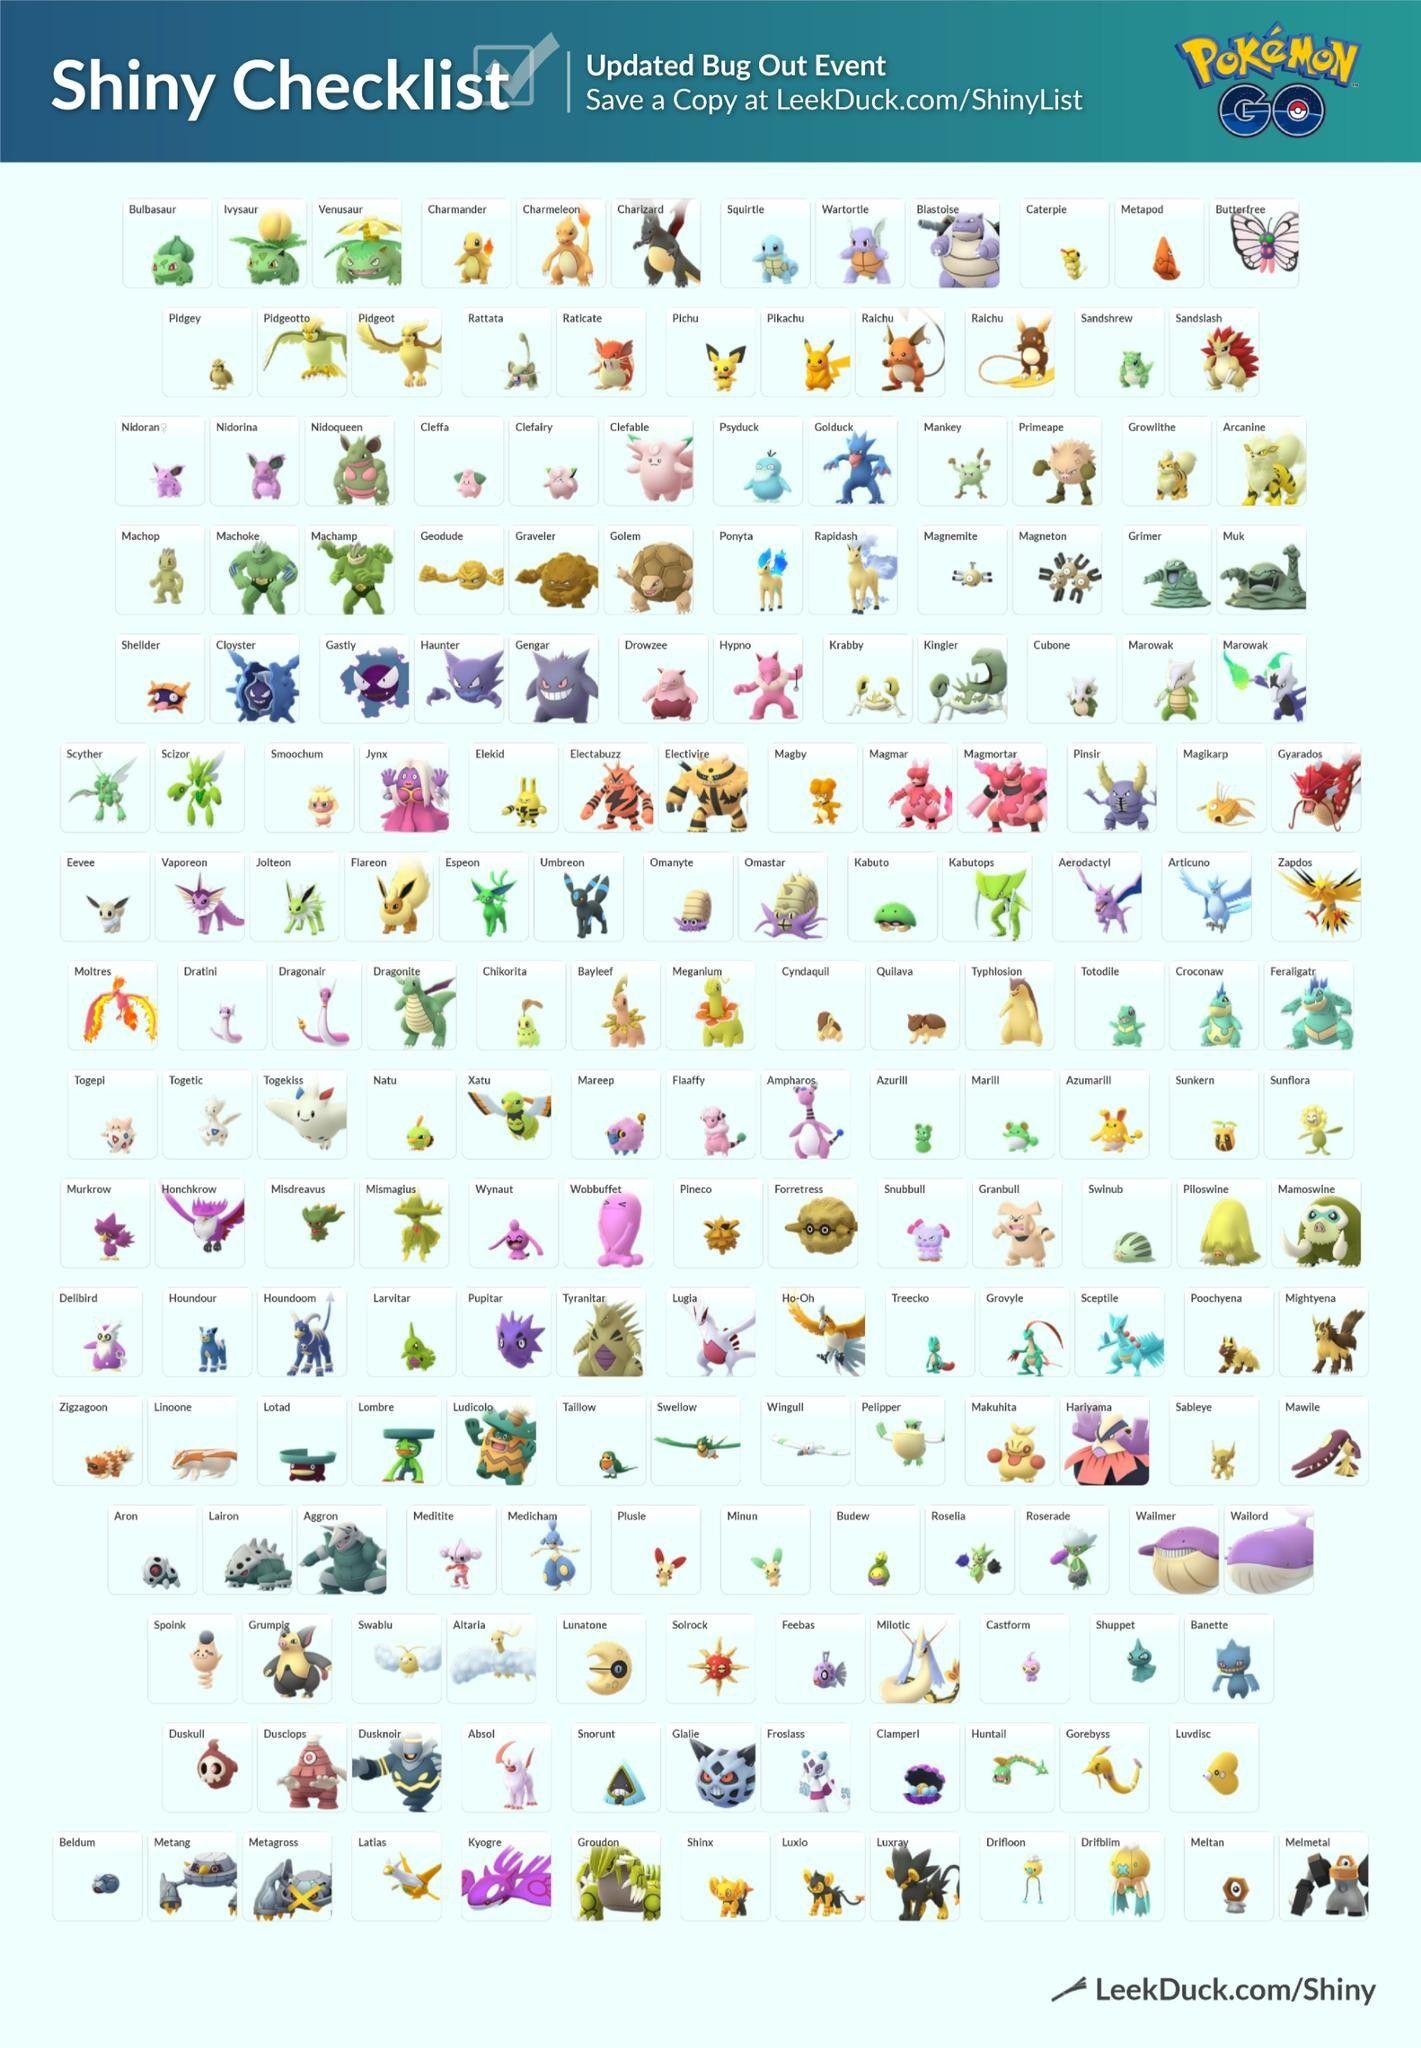 Pokémon Go: Complete list of Shiny Pokémon for March 2019